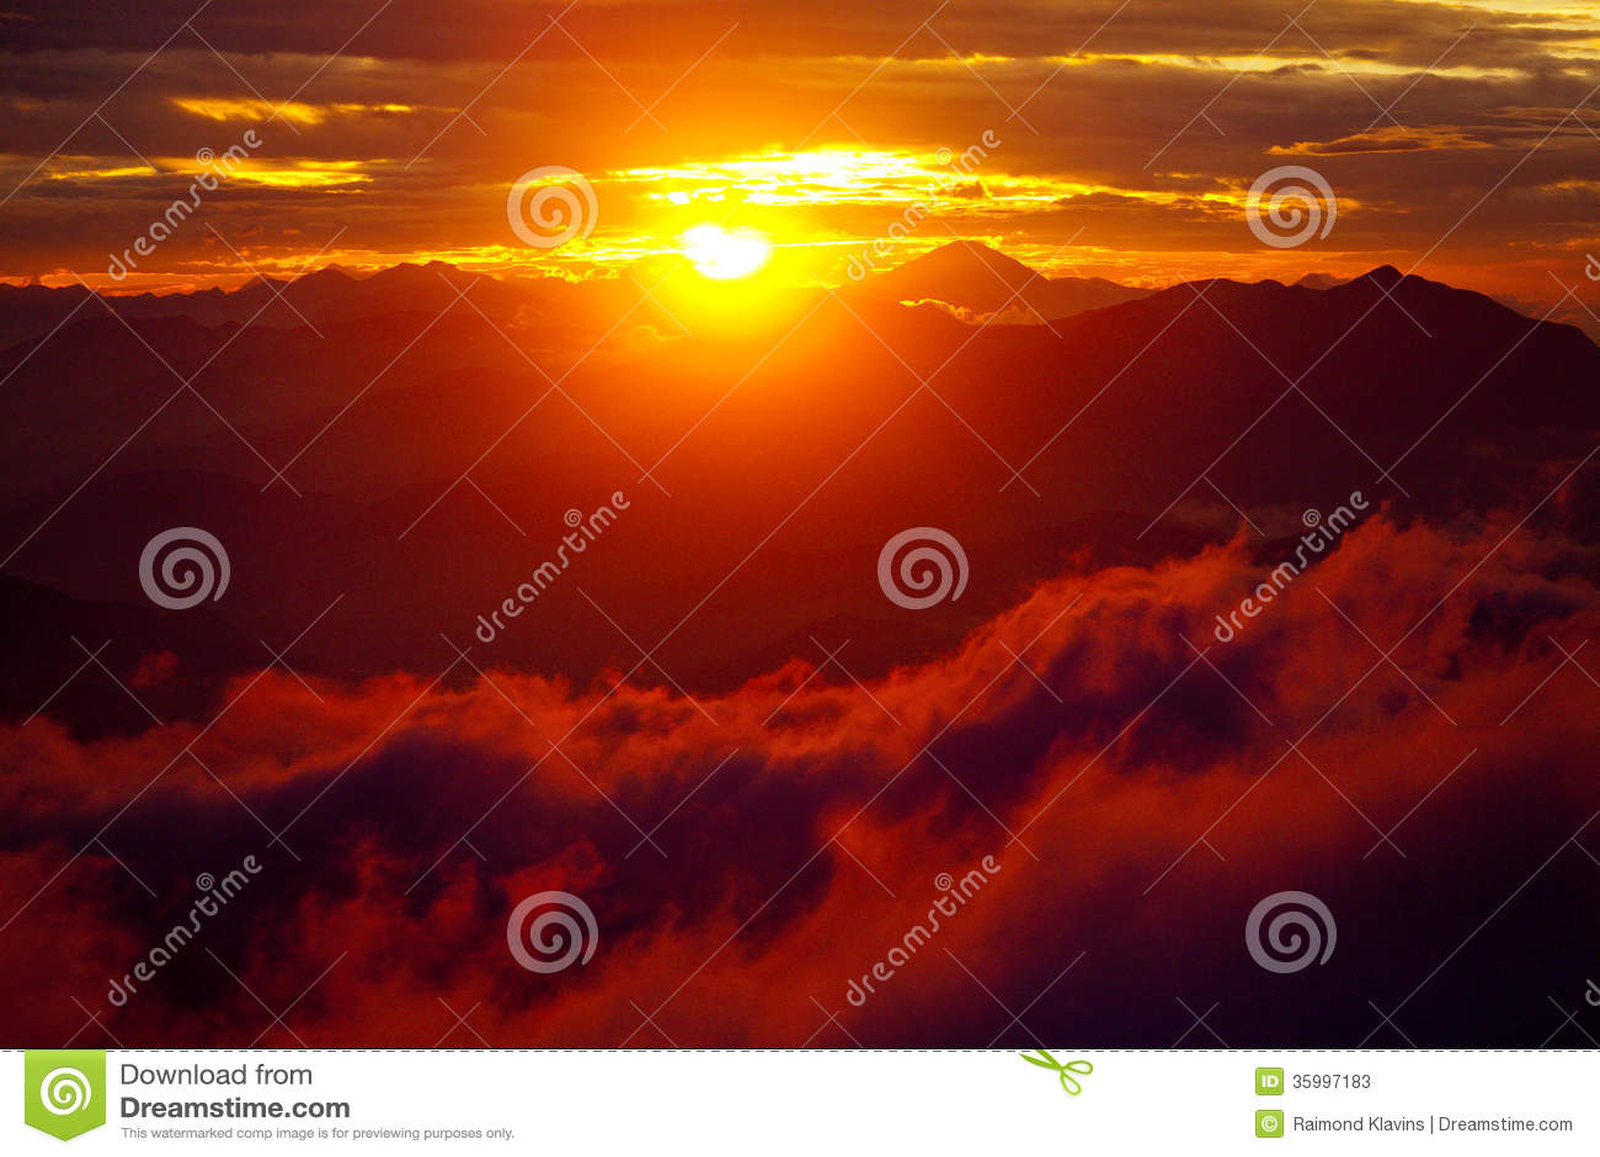 Red Sunset Himalayas Mountain Nepal